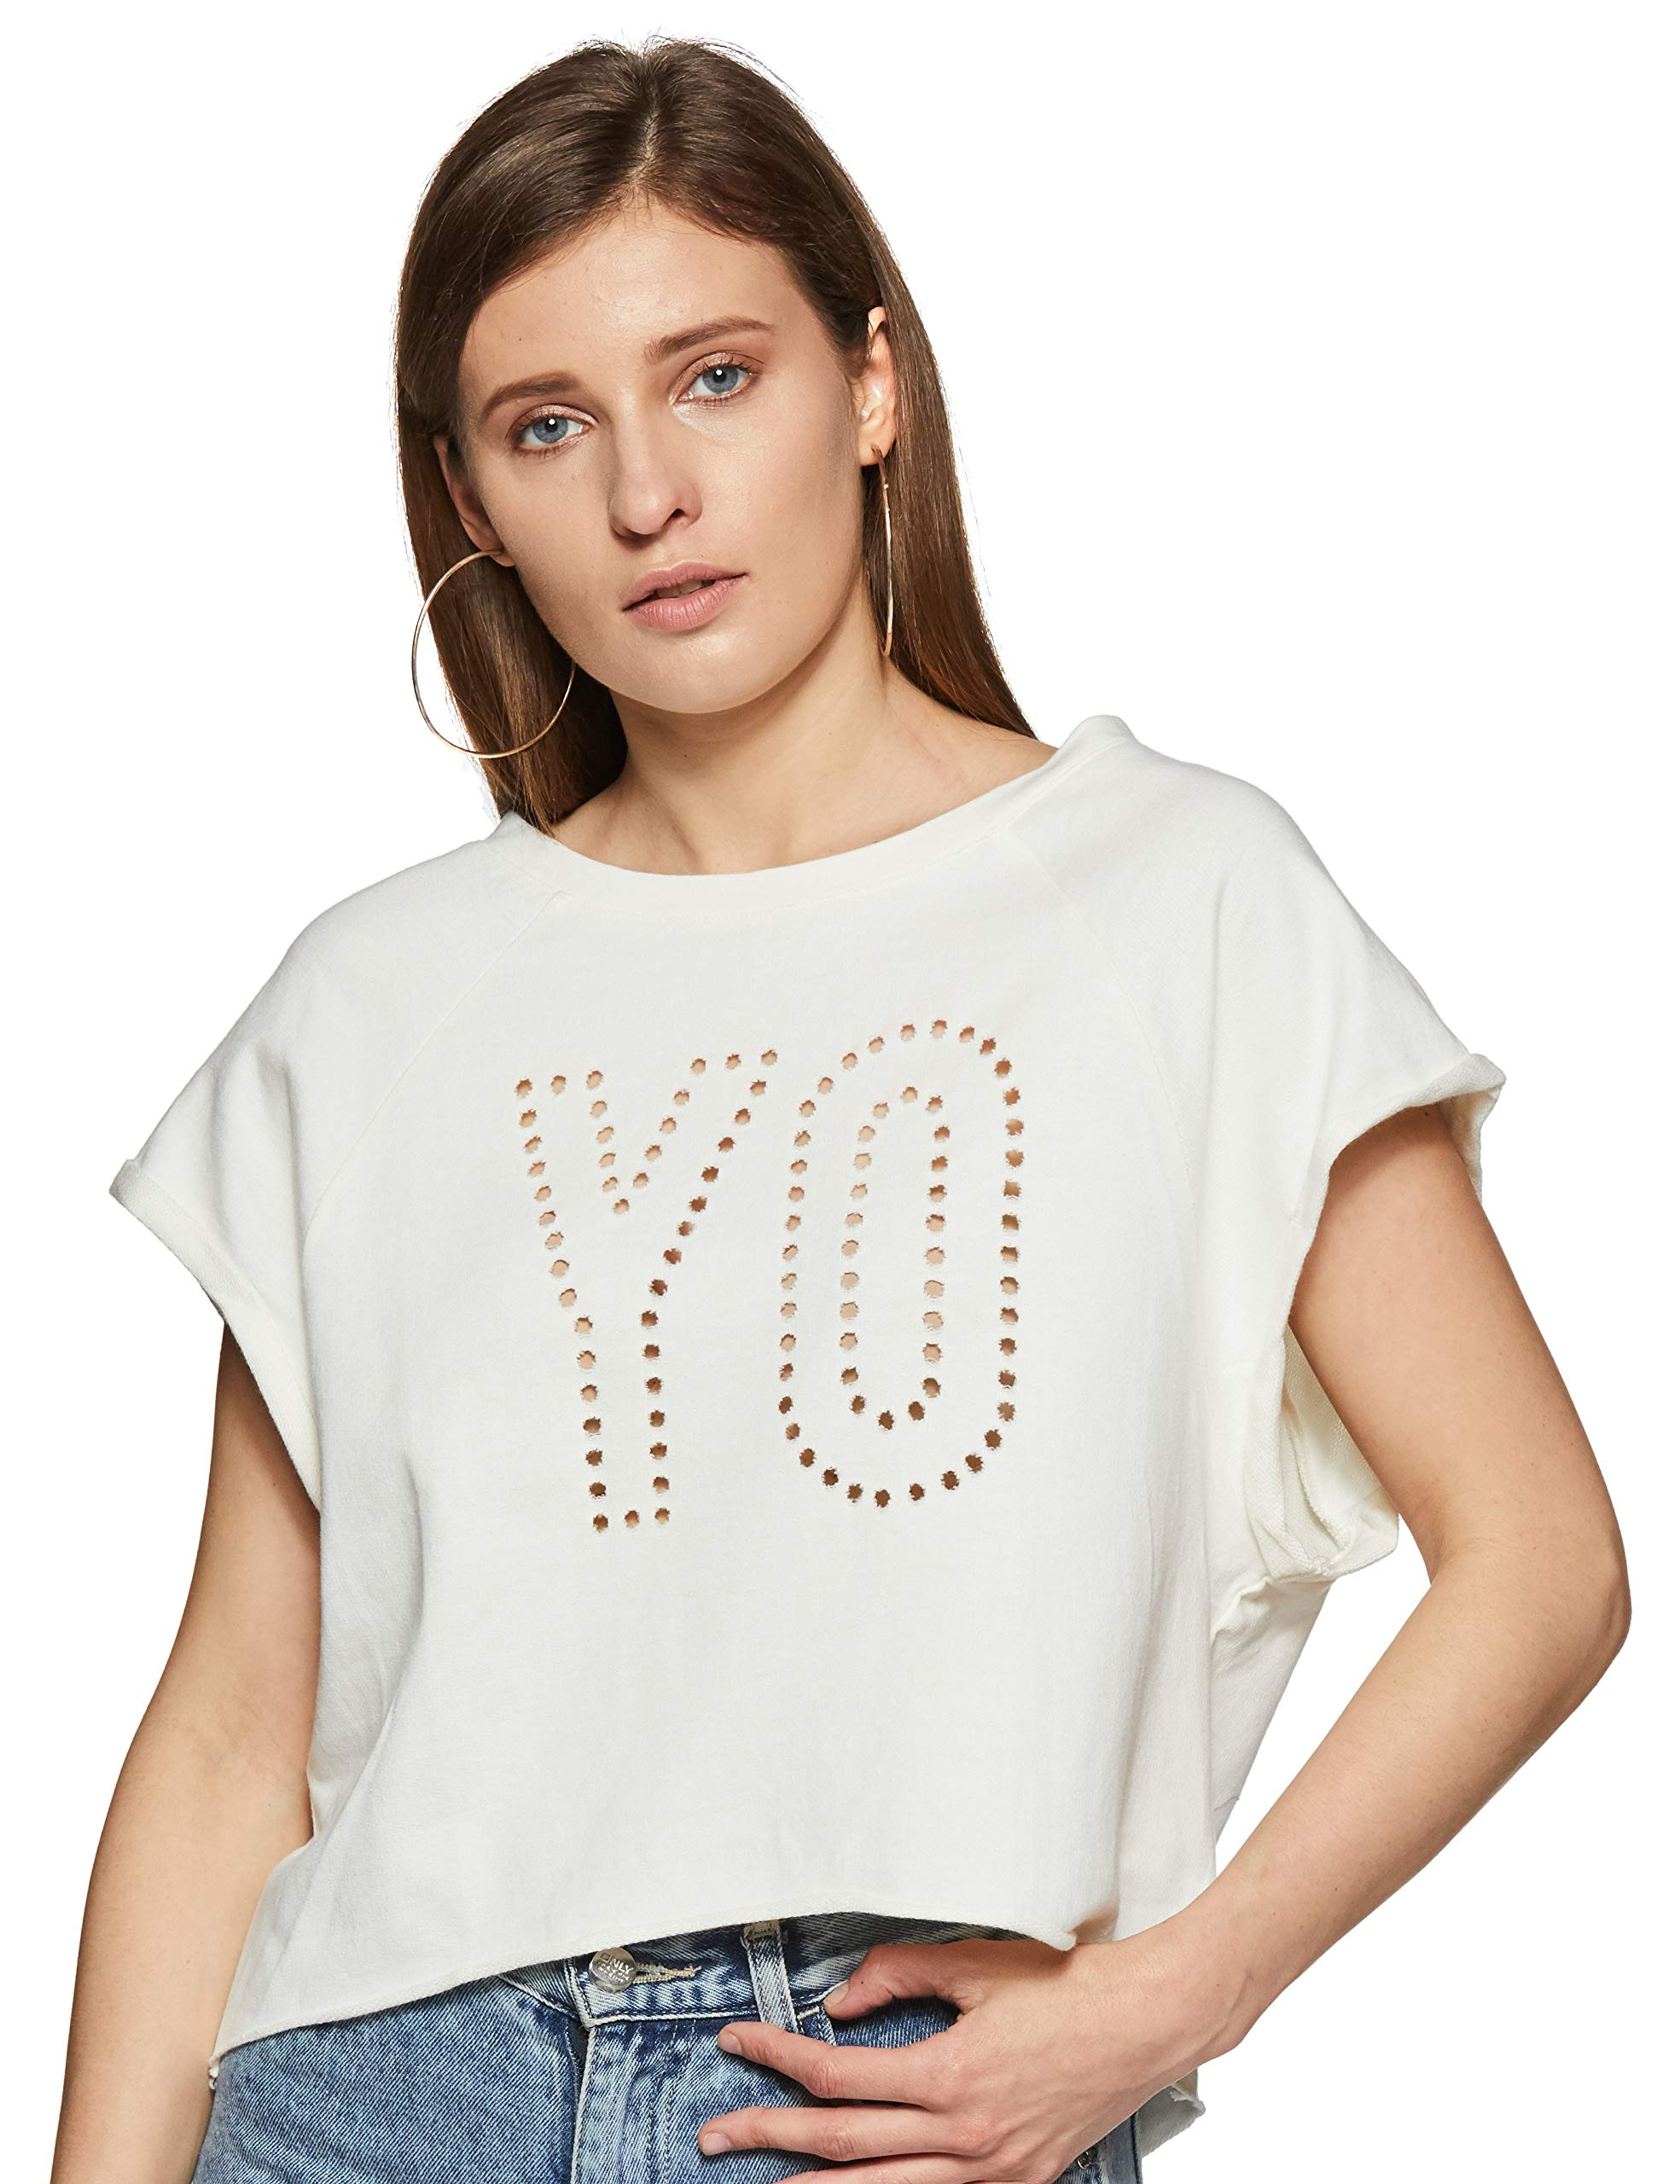 Reebok Damen Yoga French Terry T-Shirt Weiß, S